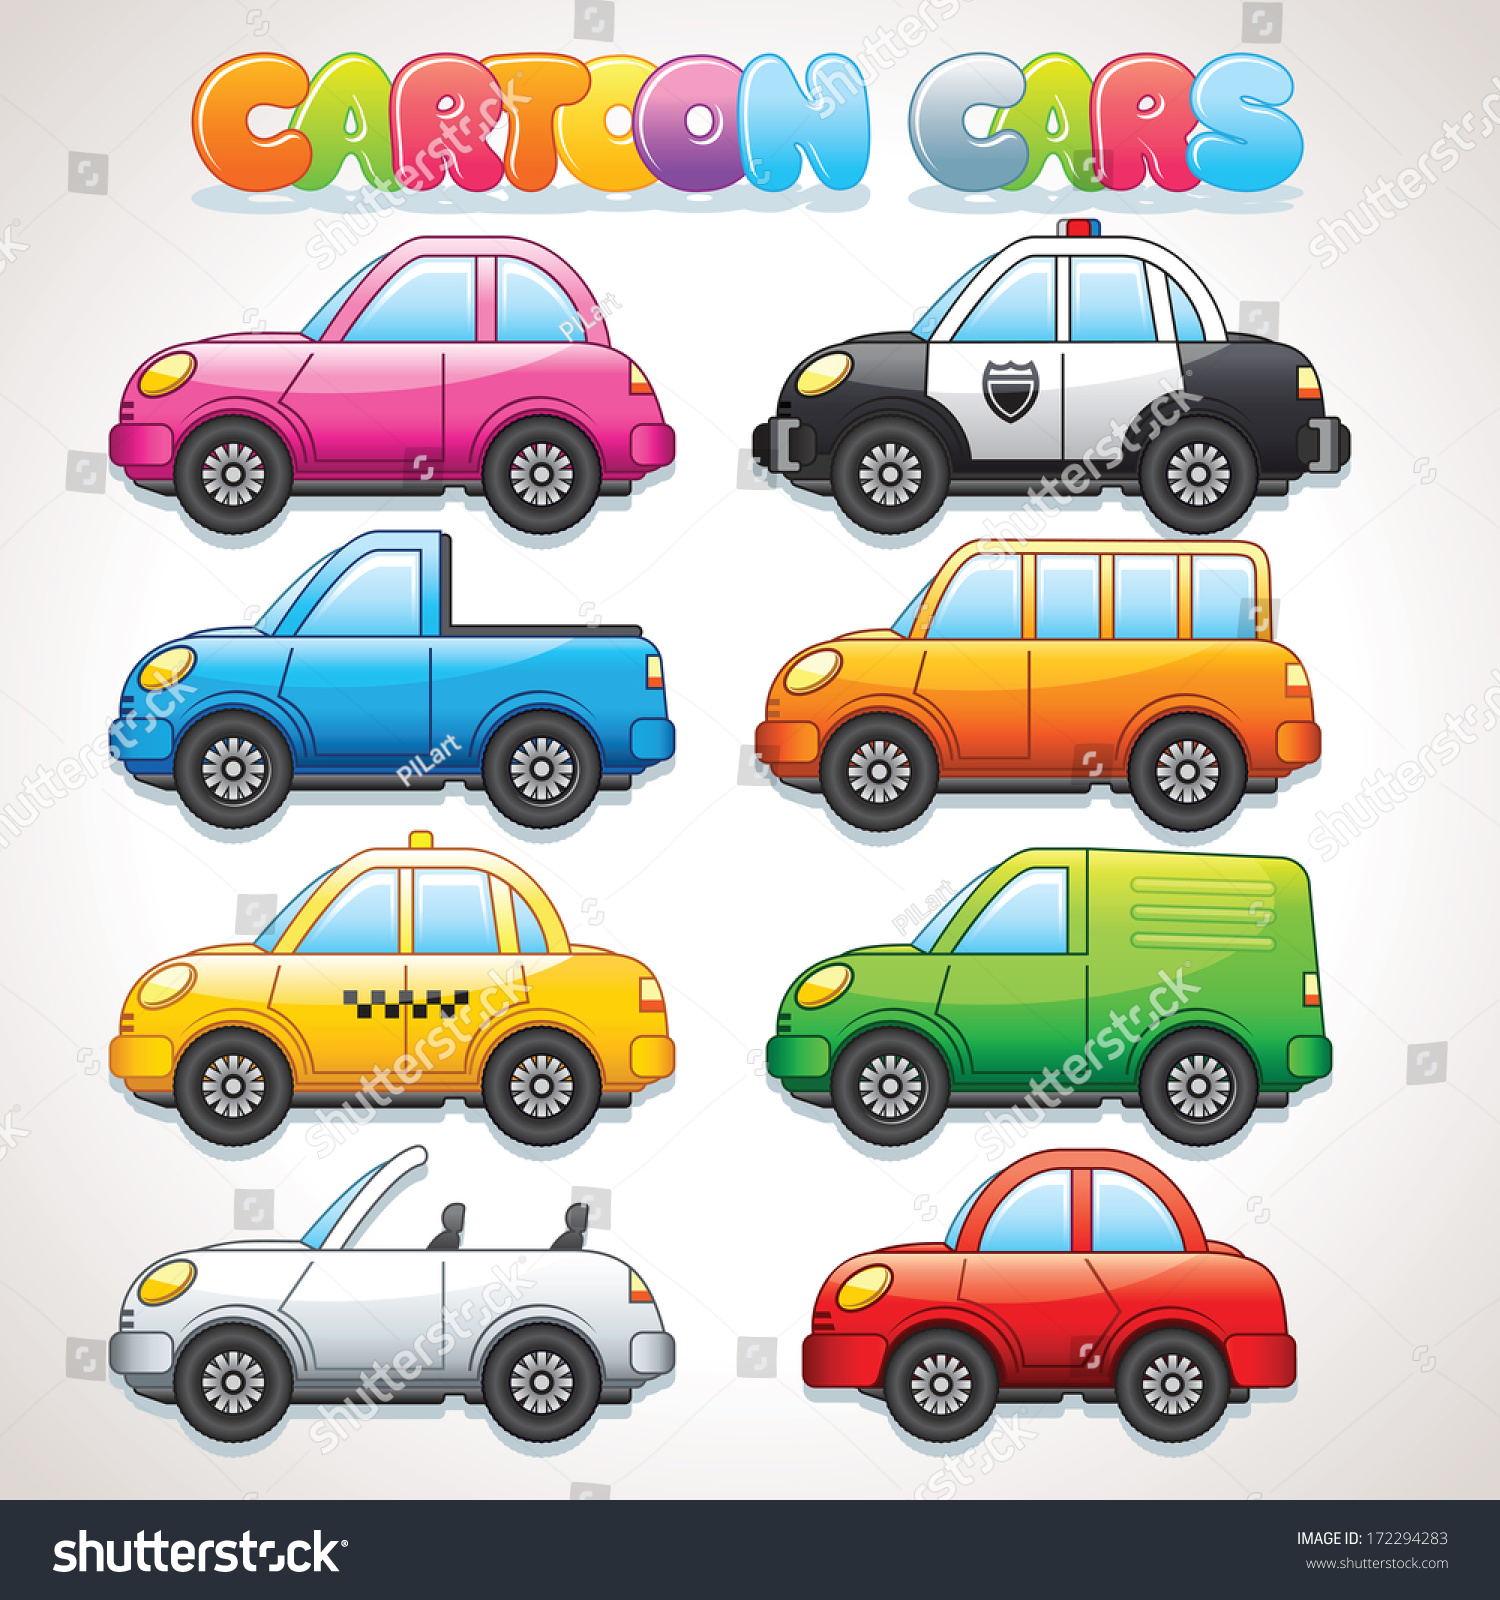 Cute Cartoon Cars Police Taxi Cabrio Stock Vector ...